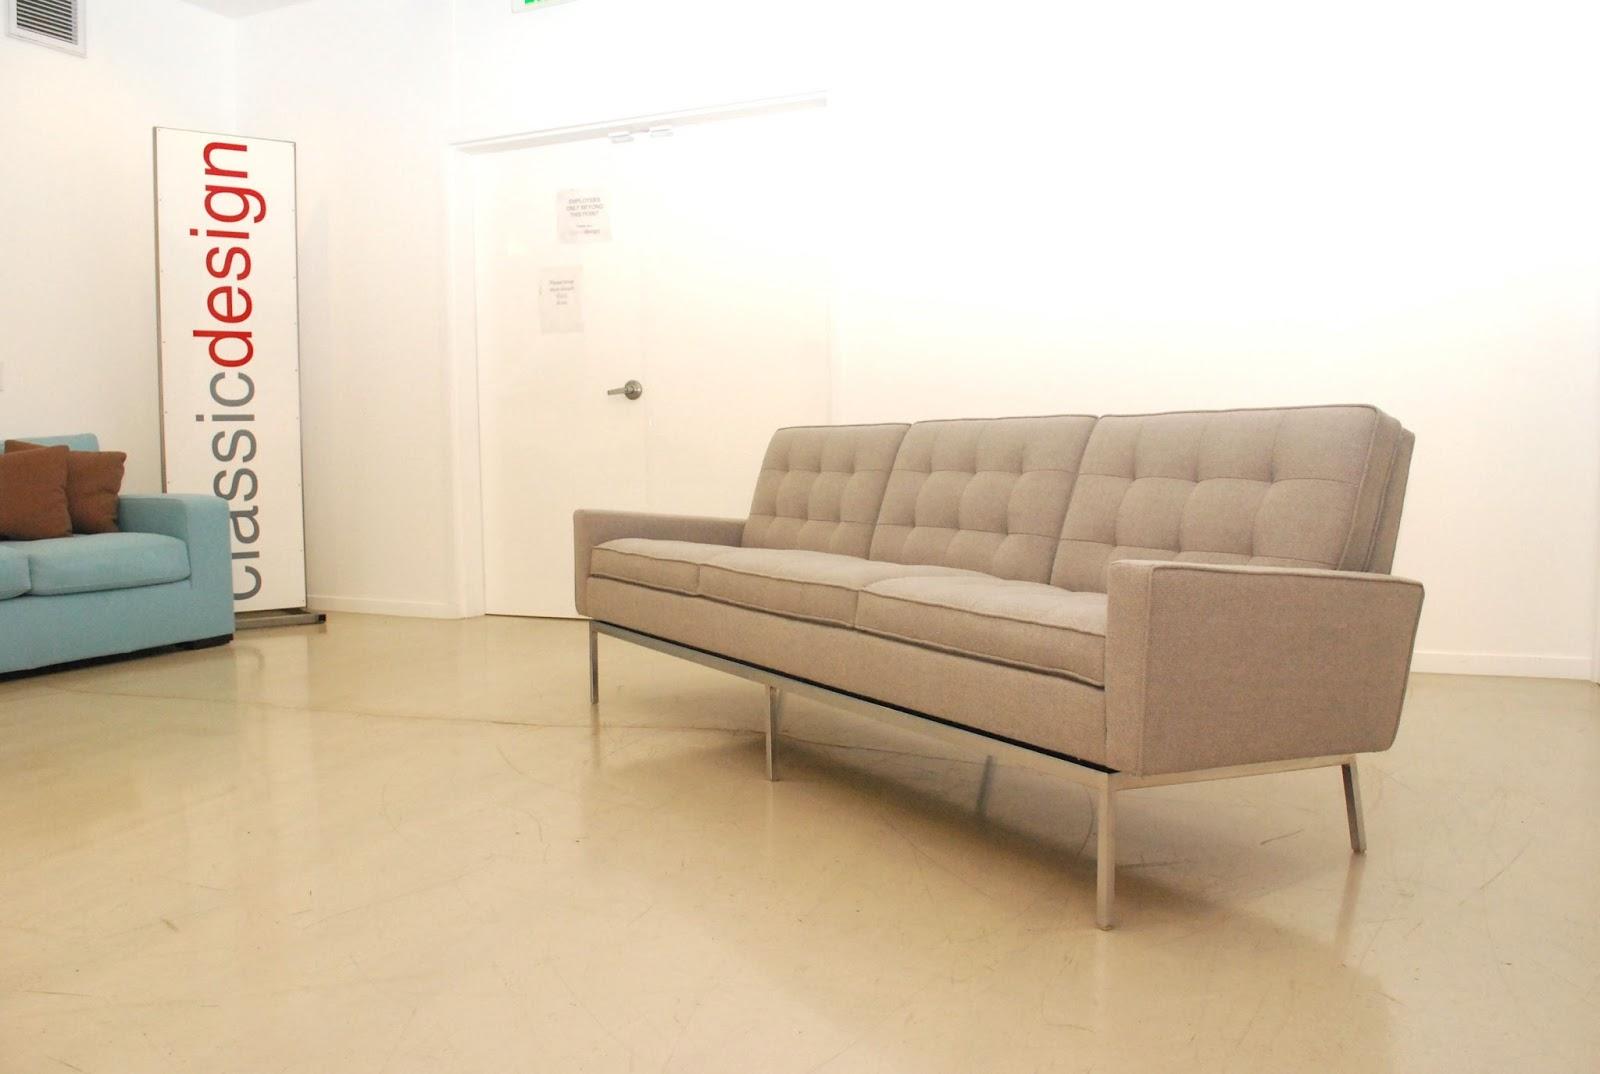 clic design sofa sesame street flip open canada knoll vintage a treasure in storage the florence